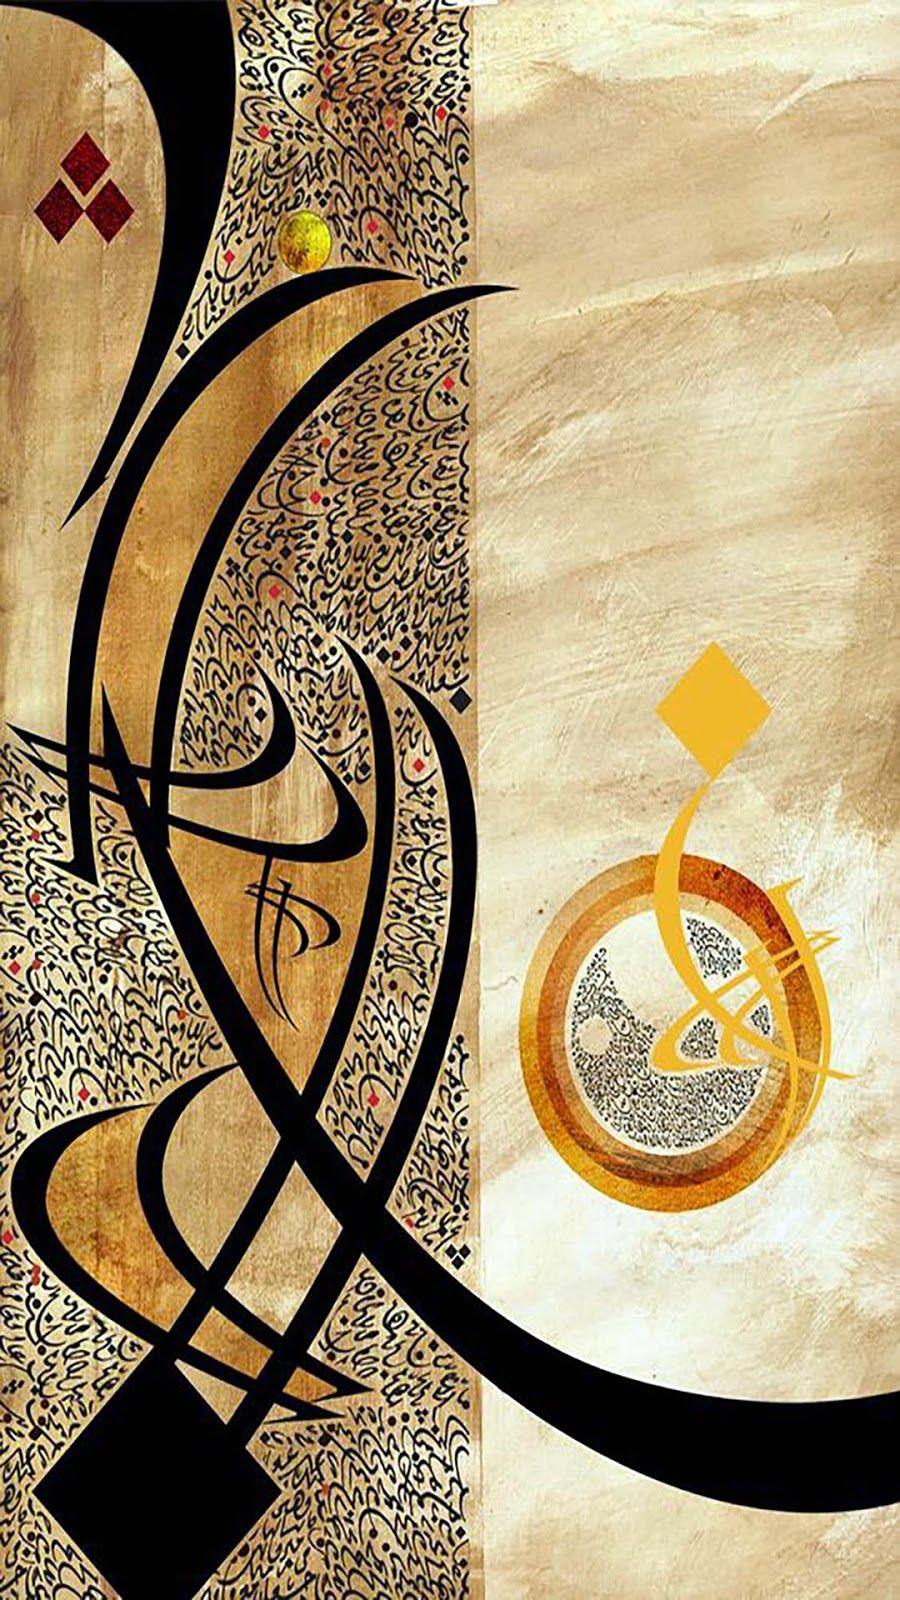 Kaligrafi Seni kaligrafi, Seni, Kaligrafi islam